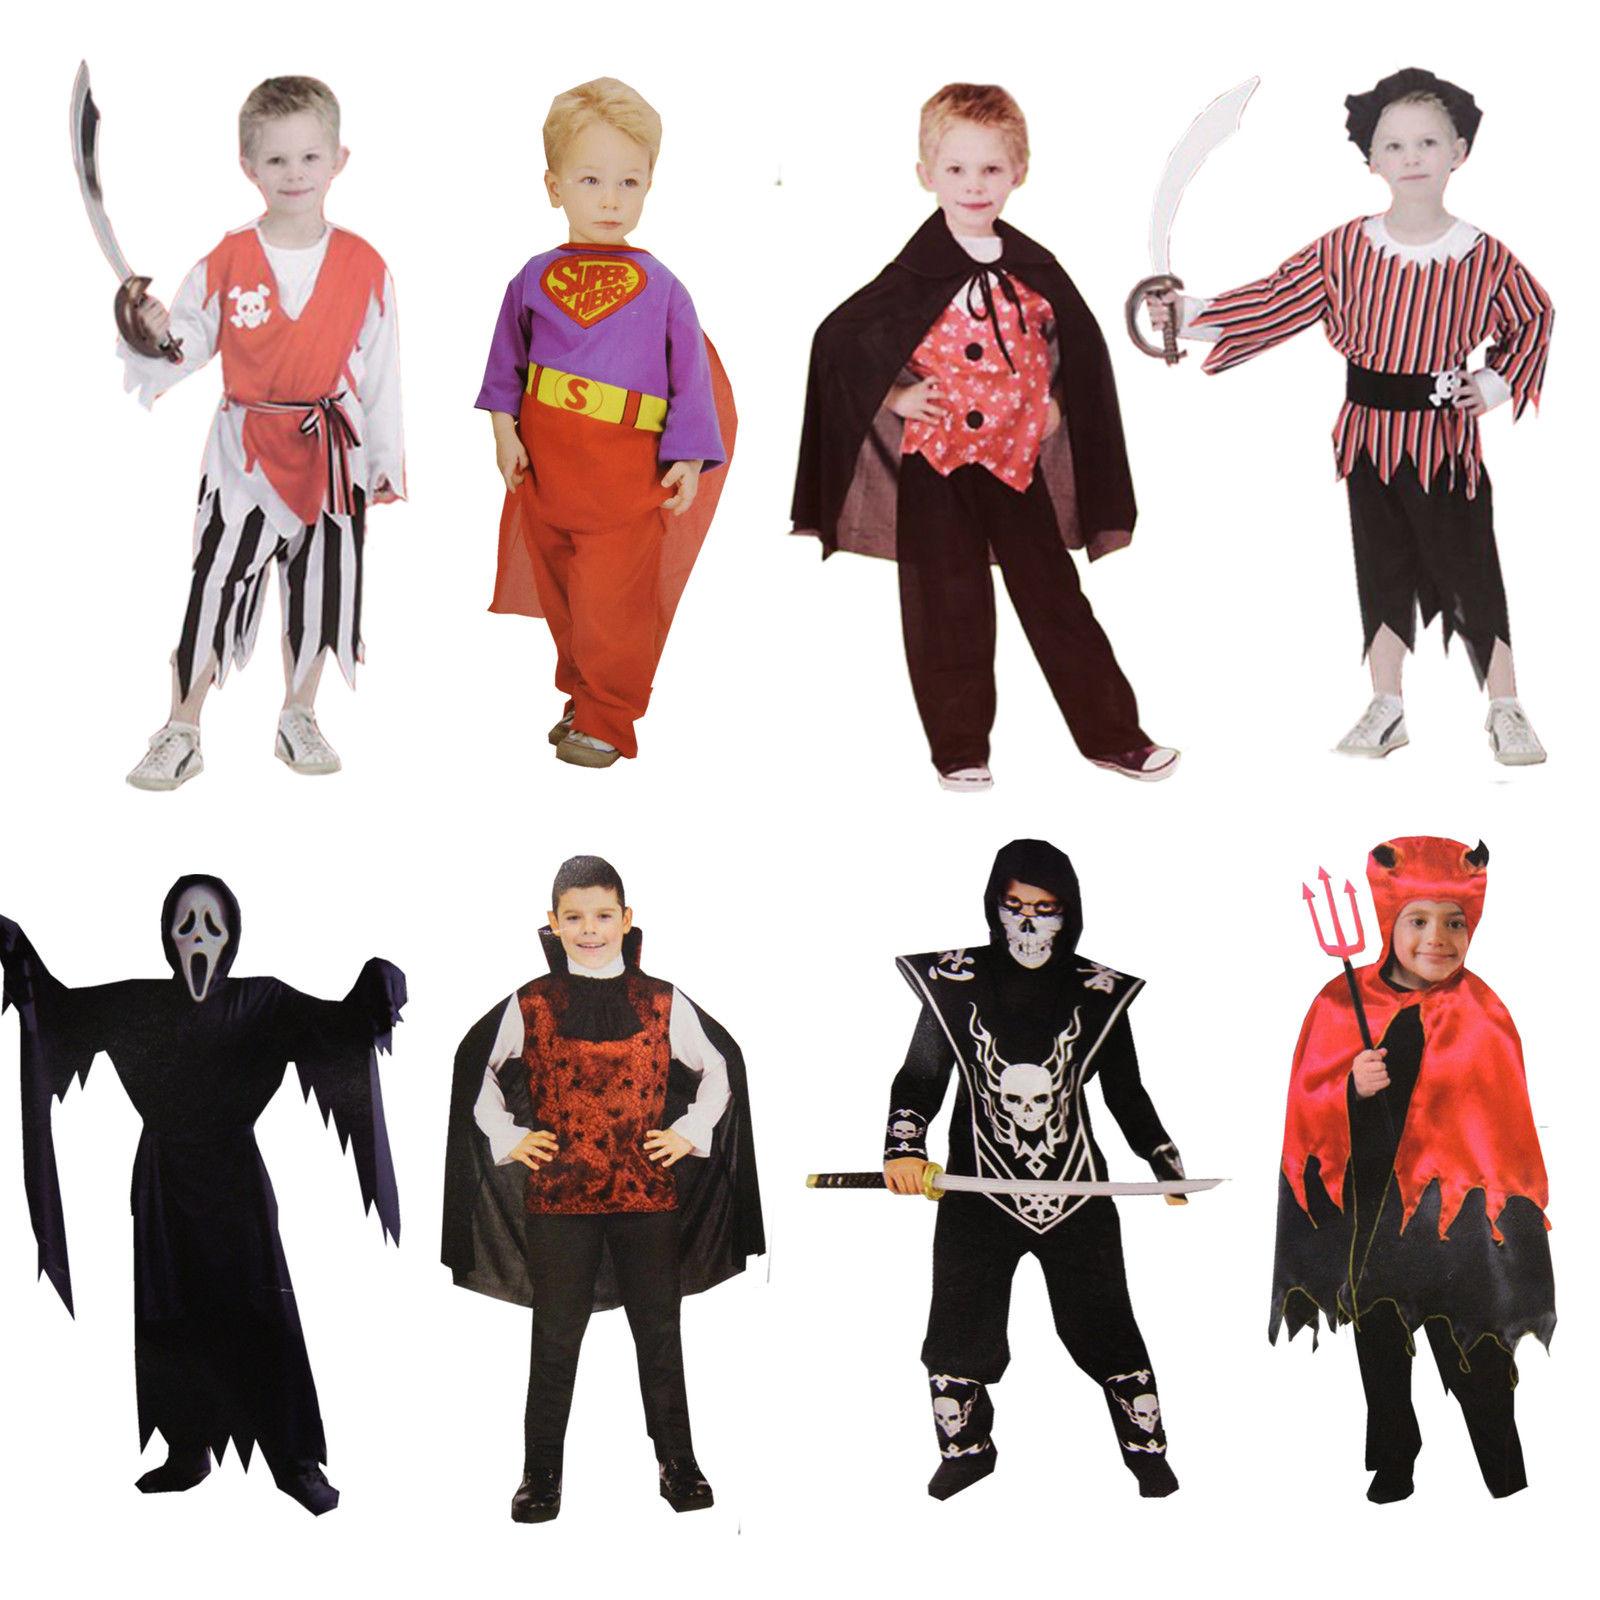 Kinder Kostüm Jungs Halloween Fasching Pirat Vampir Teufel Suprtheld